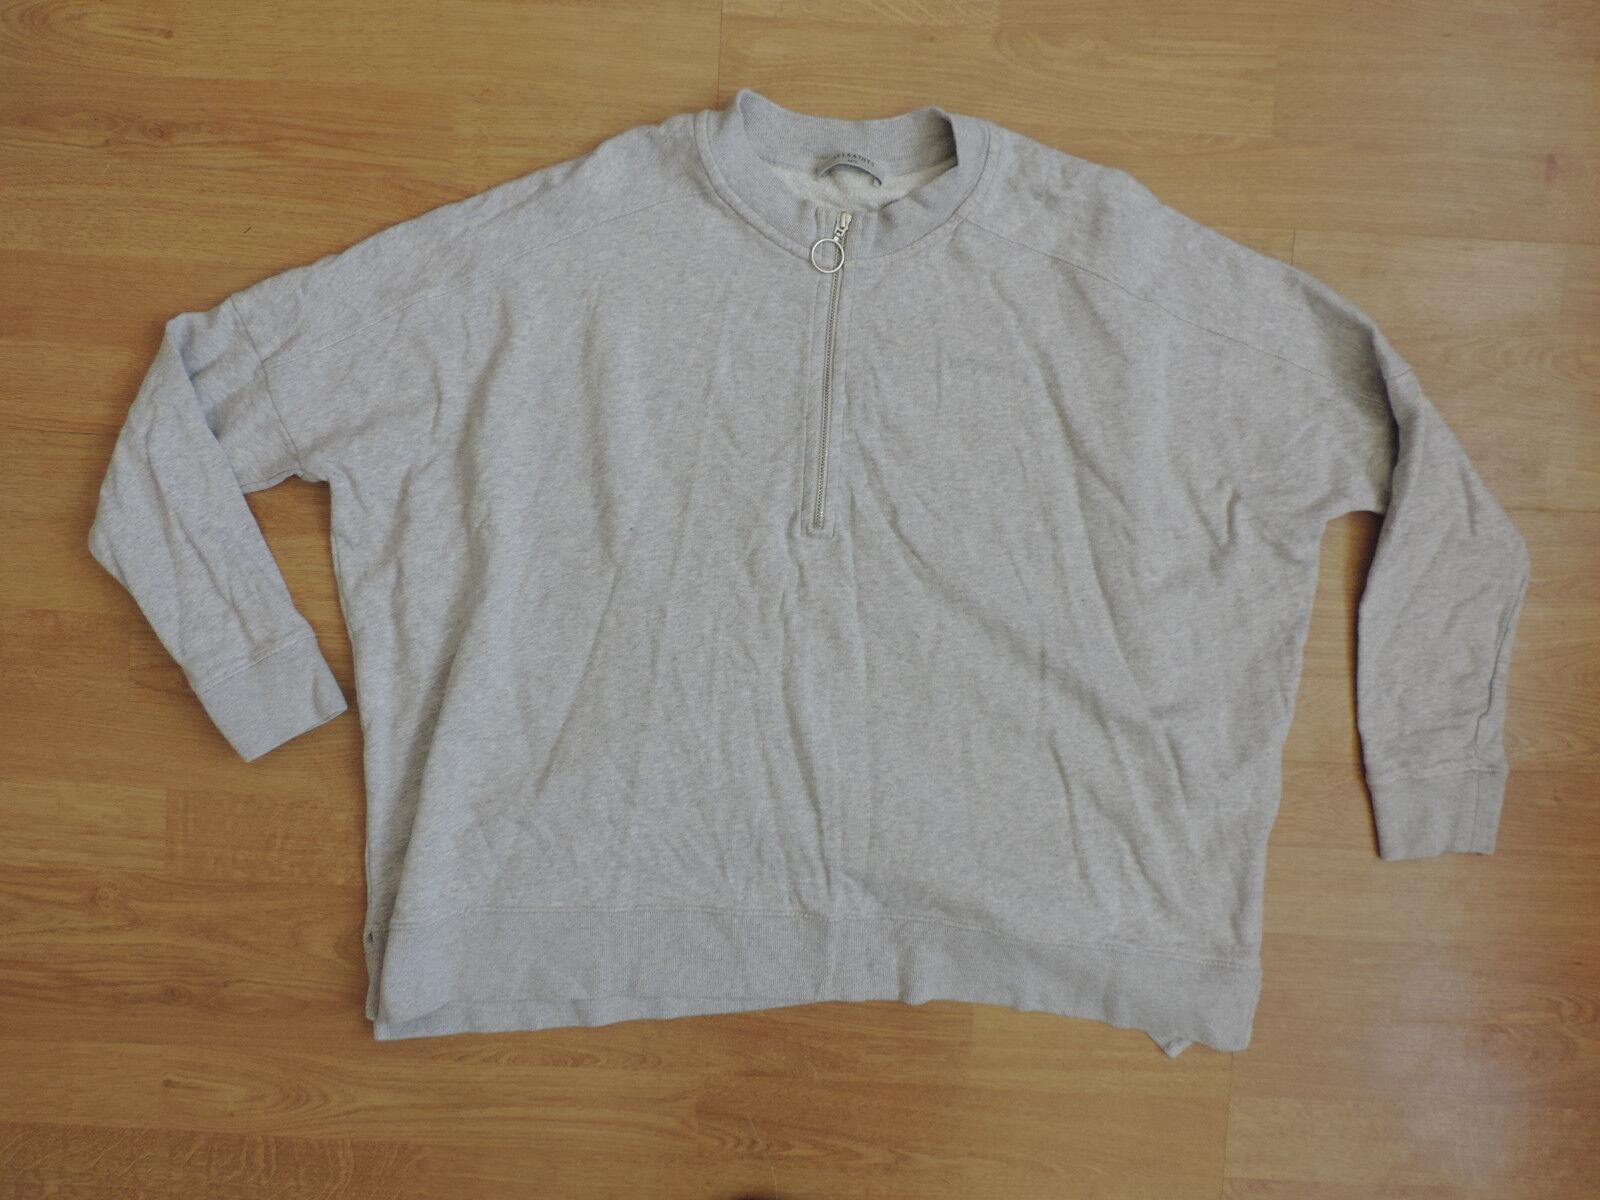 Donna AllSaints grigio Sweater Jumper K7-A9